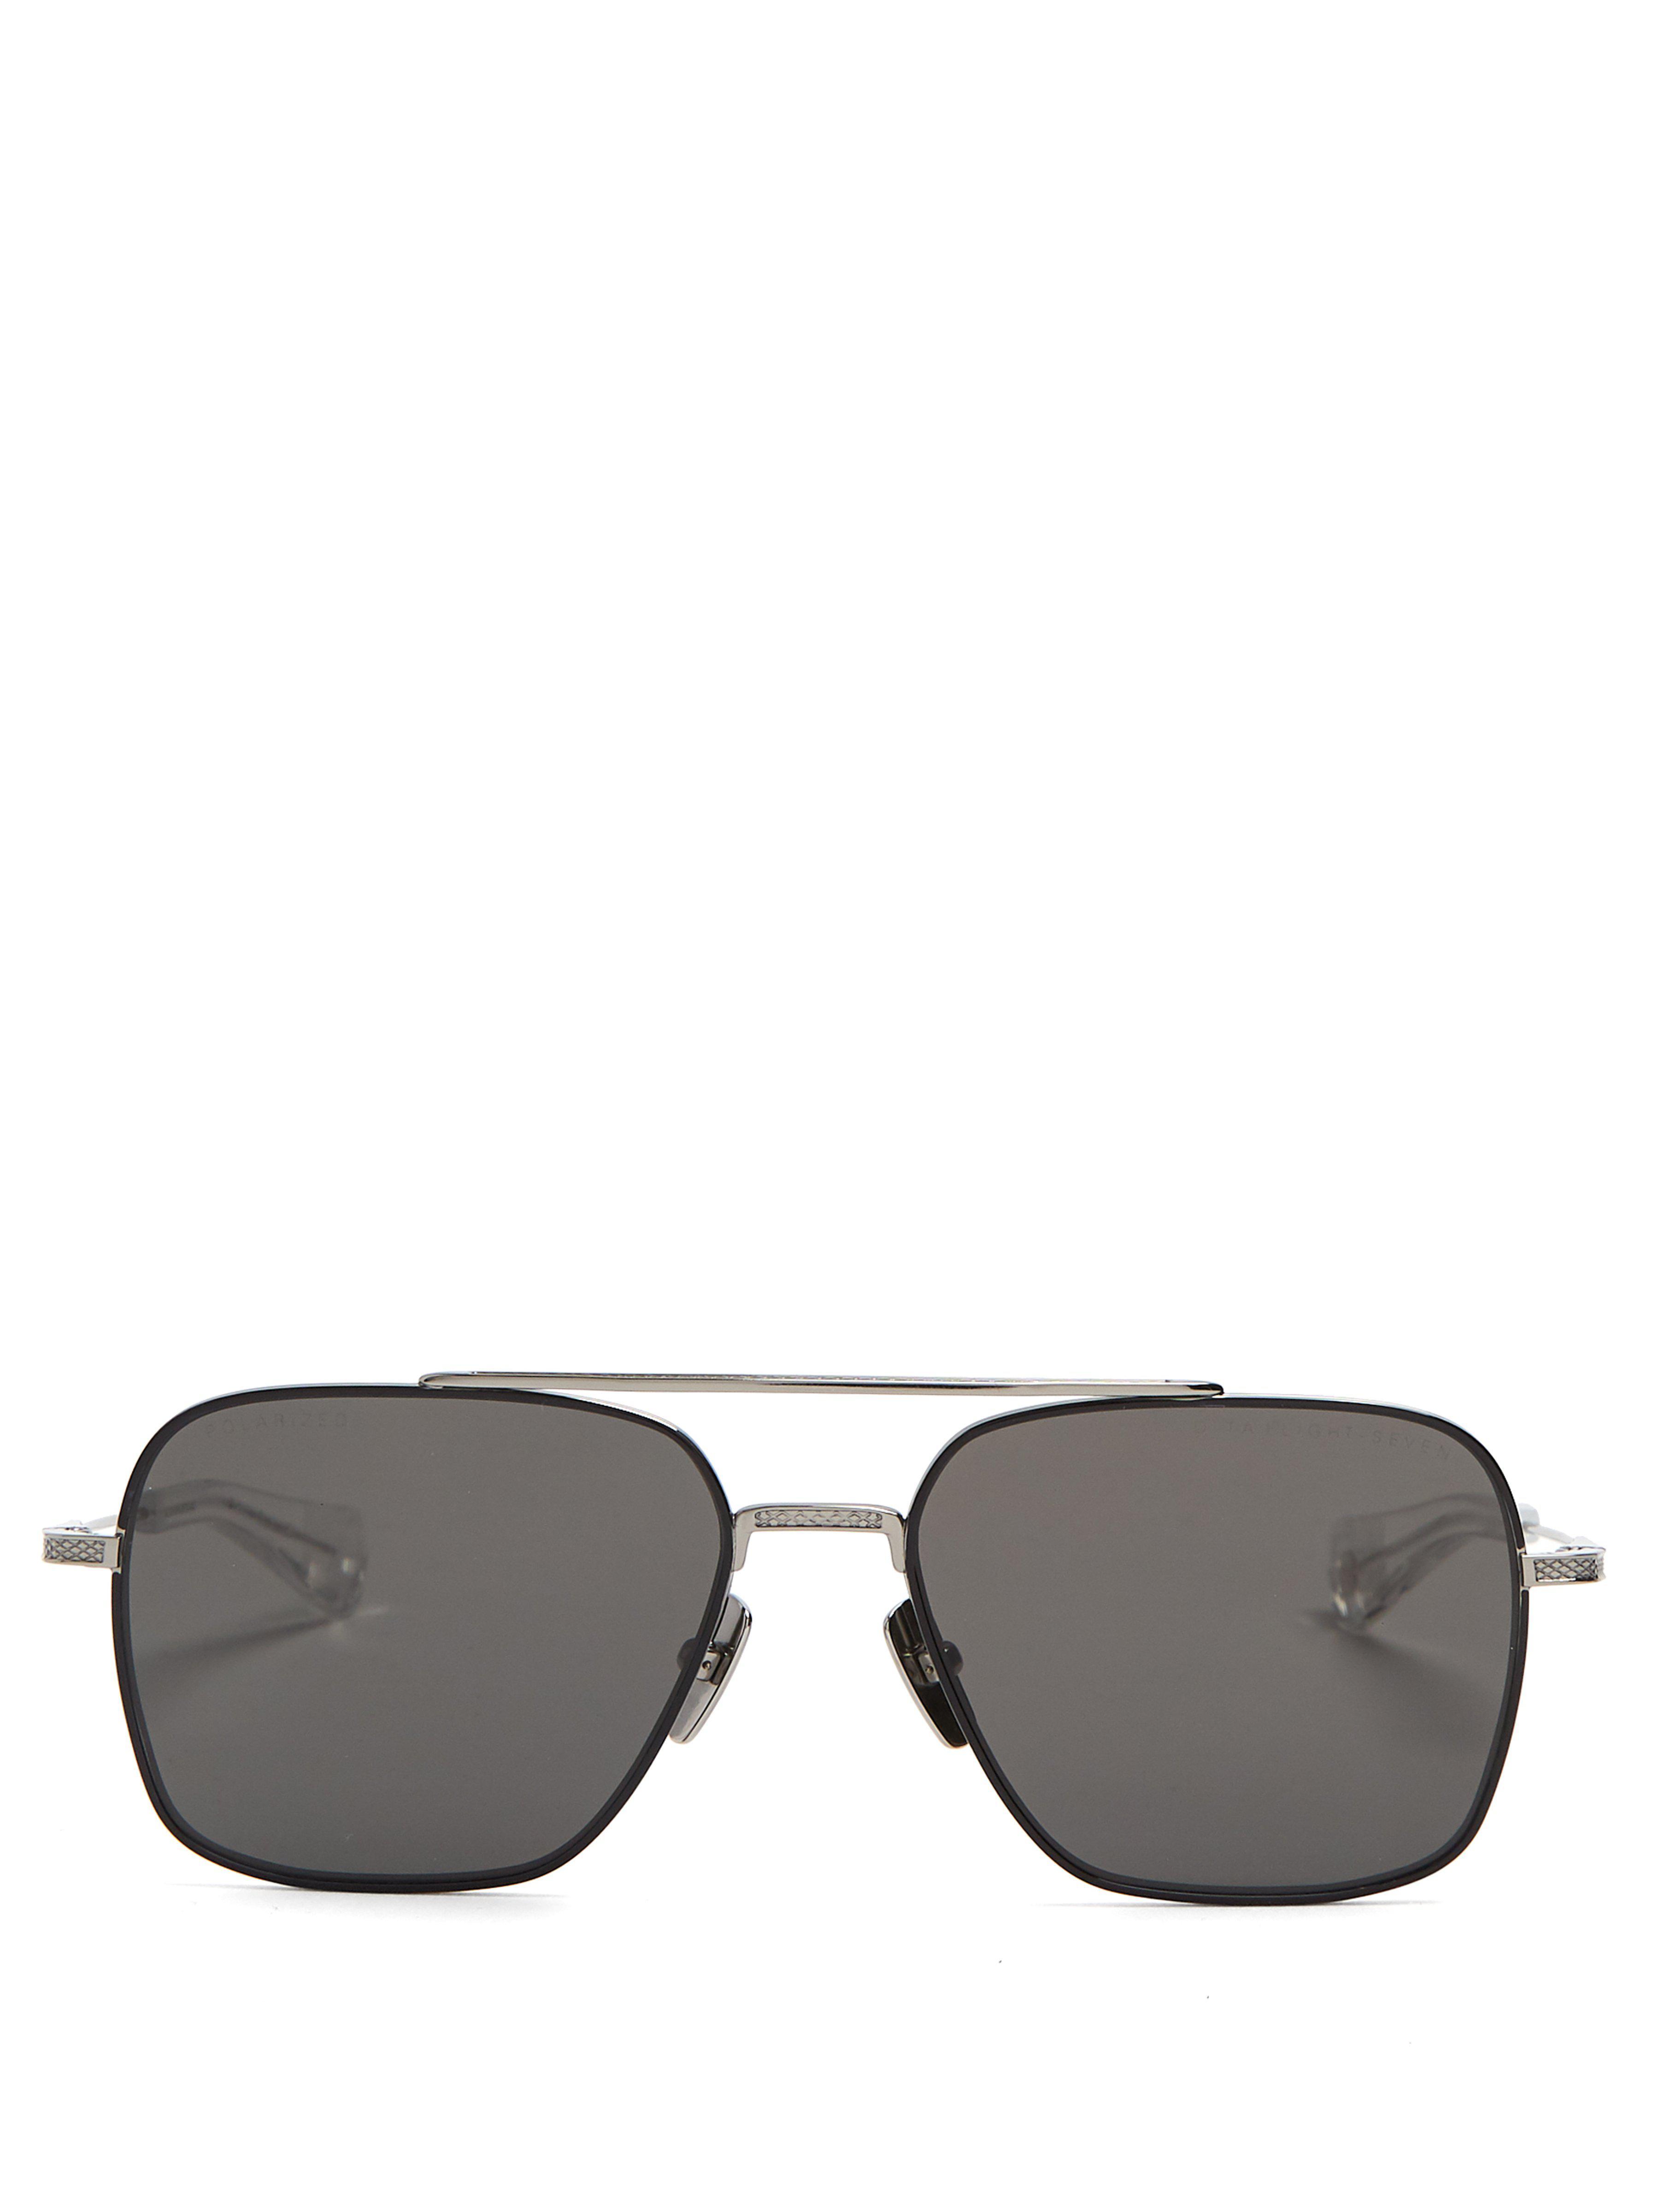 1e070b86c34 Dita Eyewear Flight Aviator Sunglasses in Black for Men - Lyst